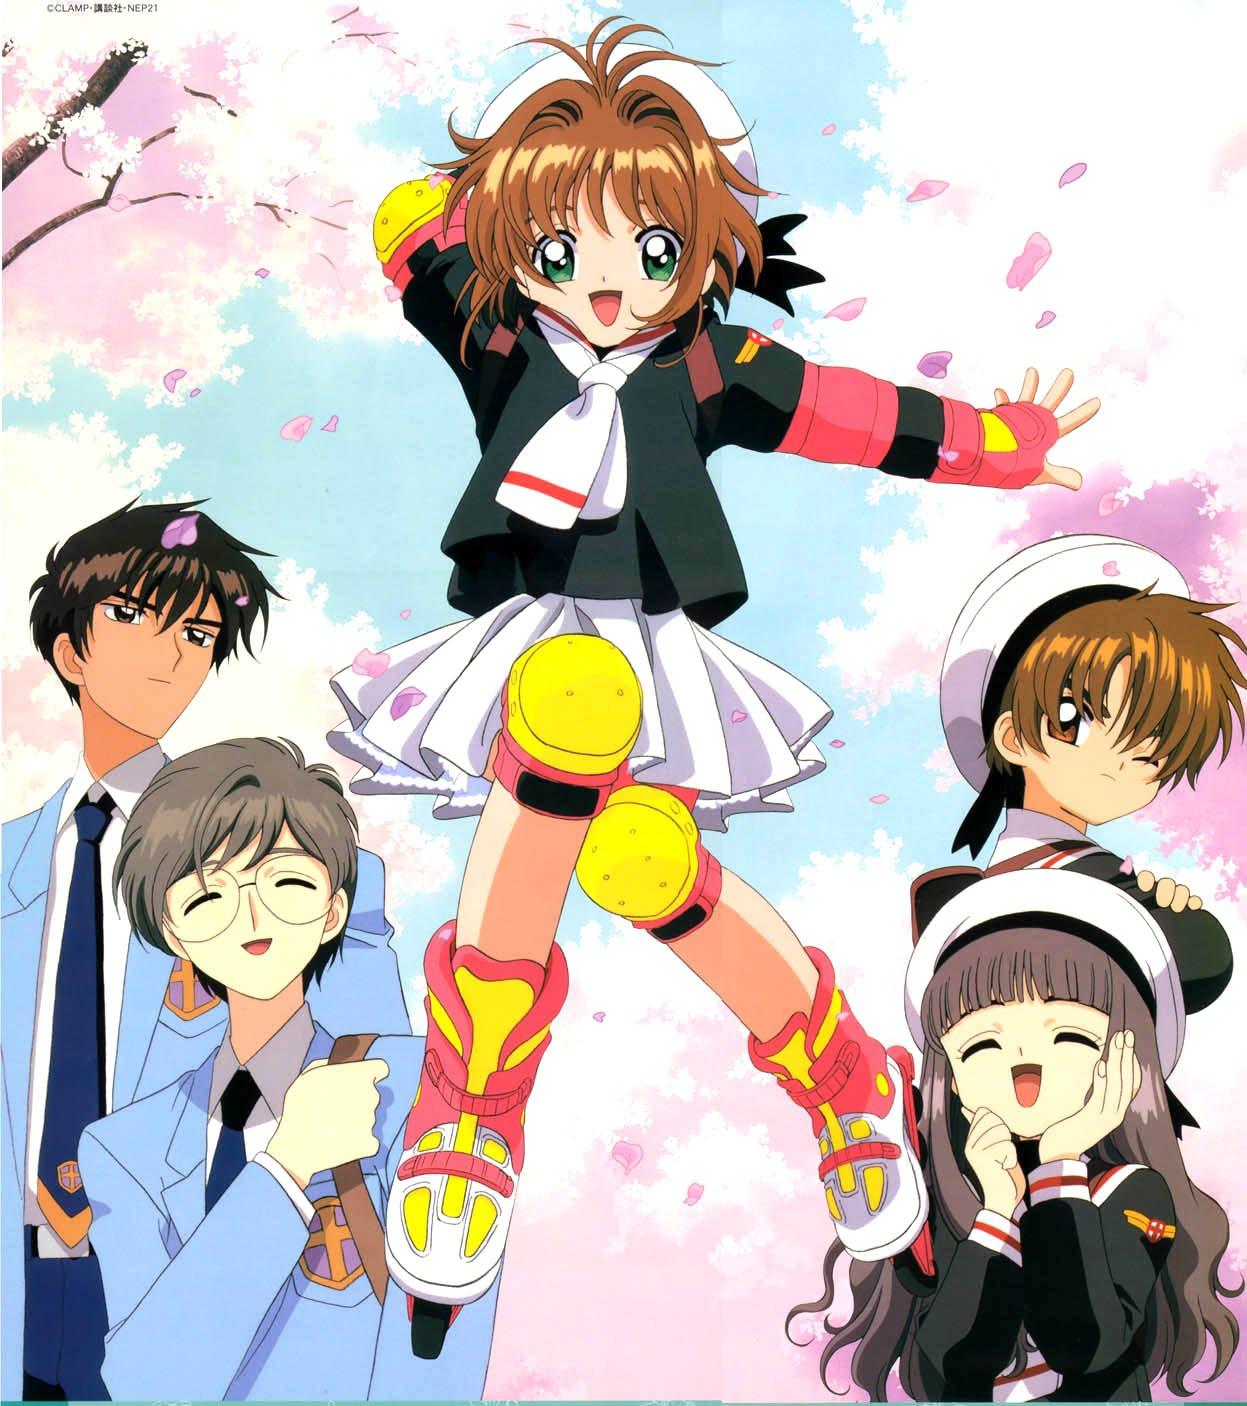 Cardcaptor Sakura Wallpapers Anime Hq Cardcaptor Sakura Pictures 4k Wallpapers 2019